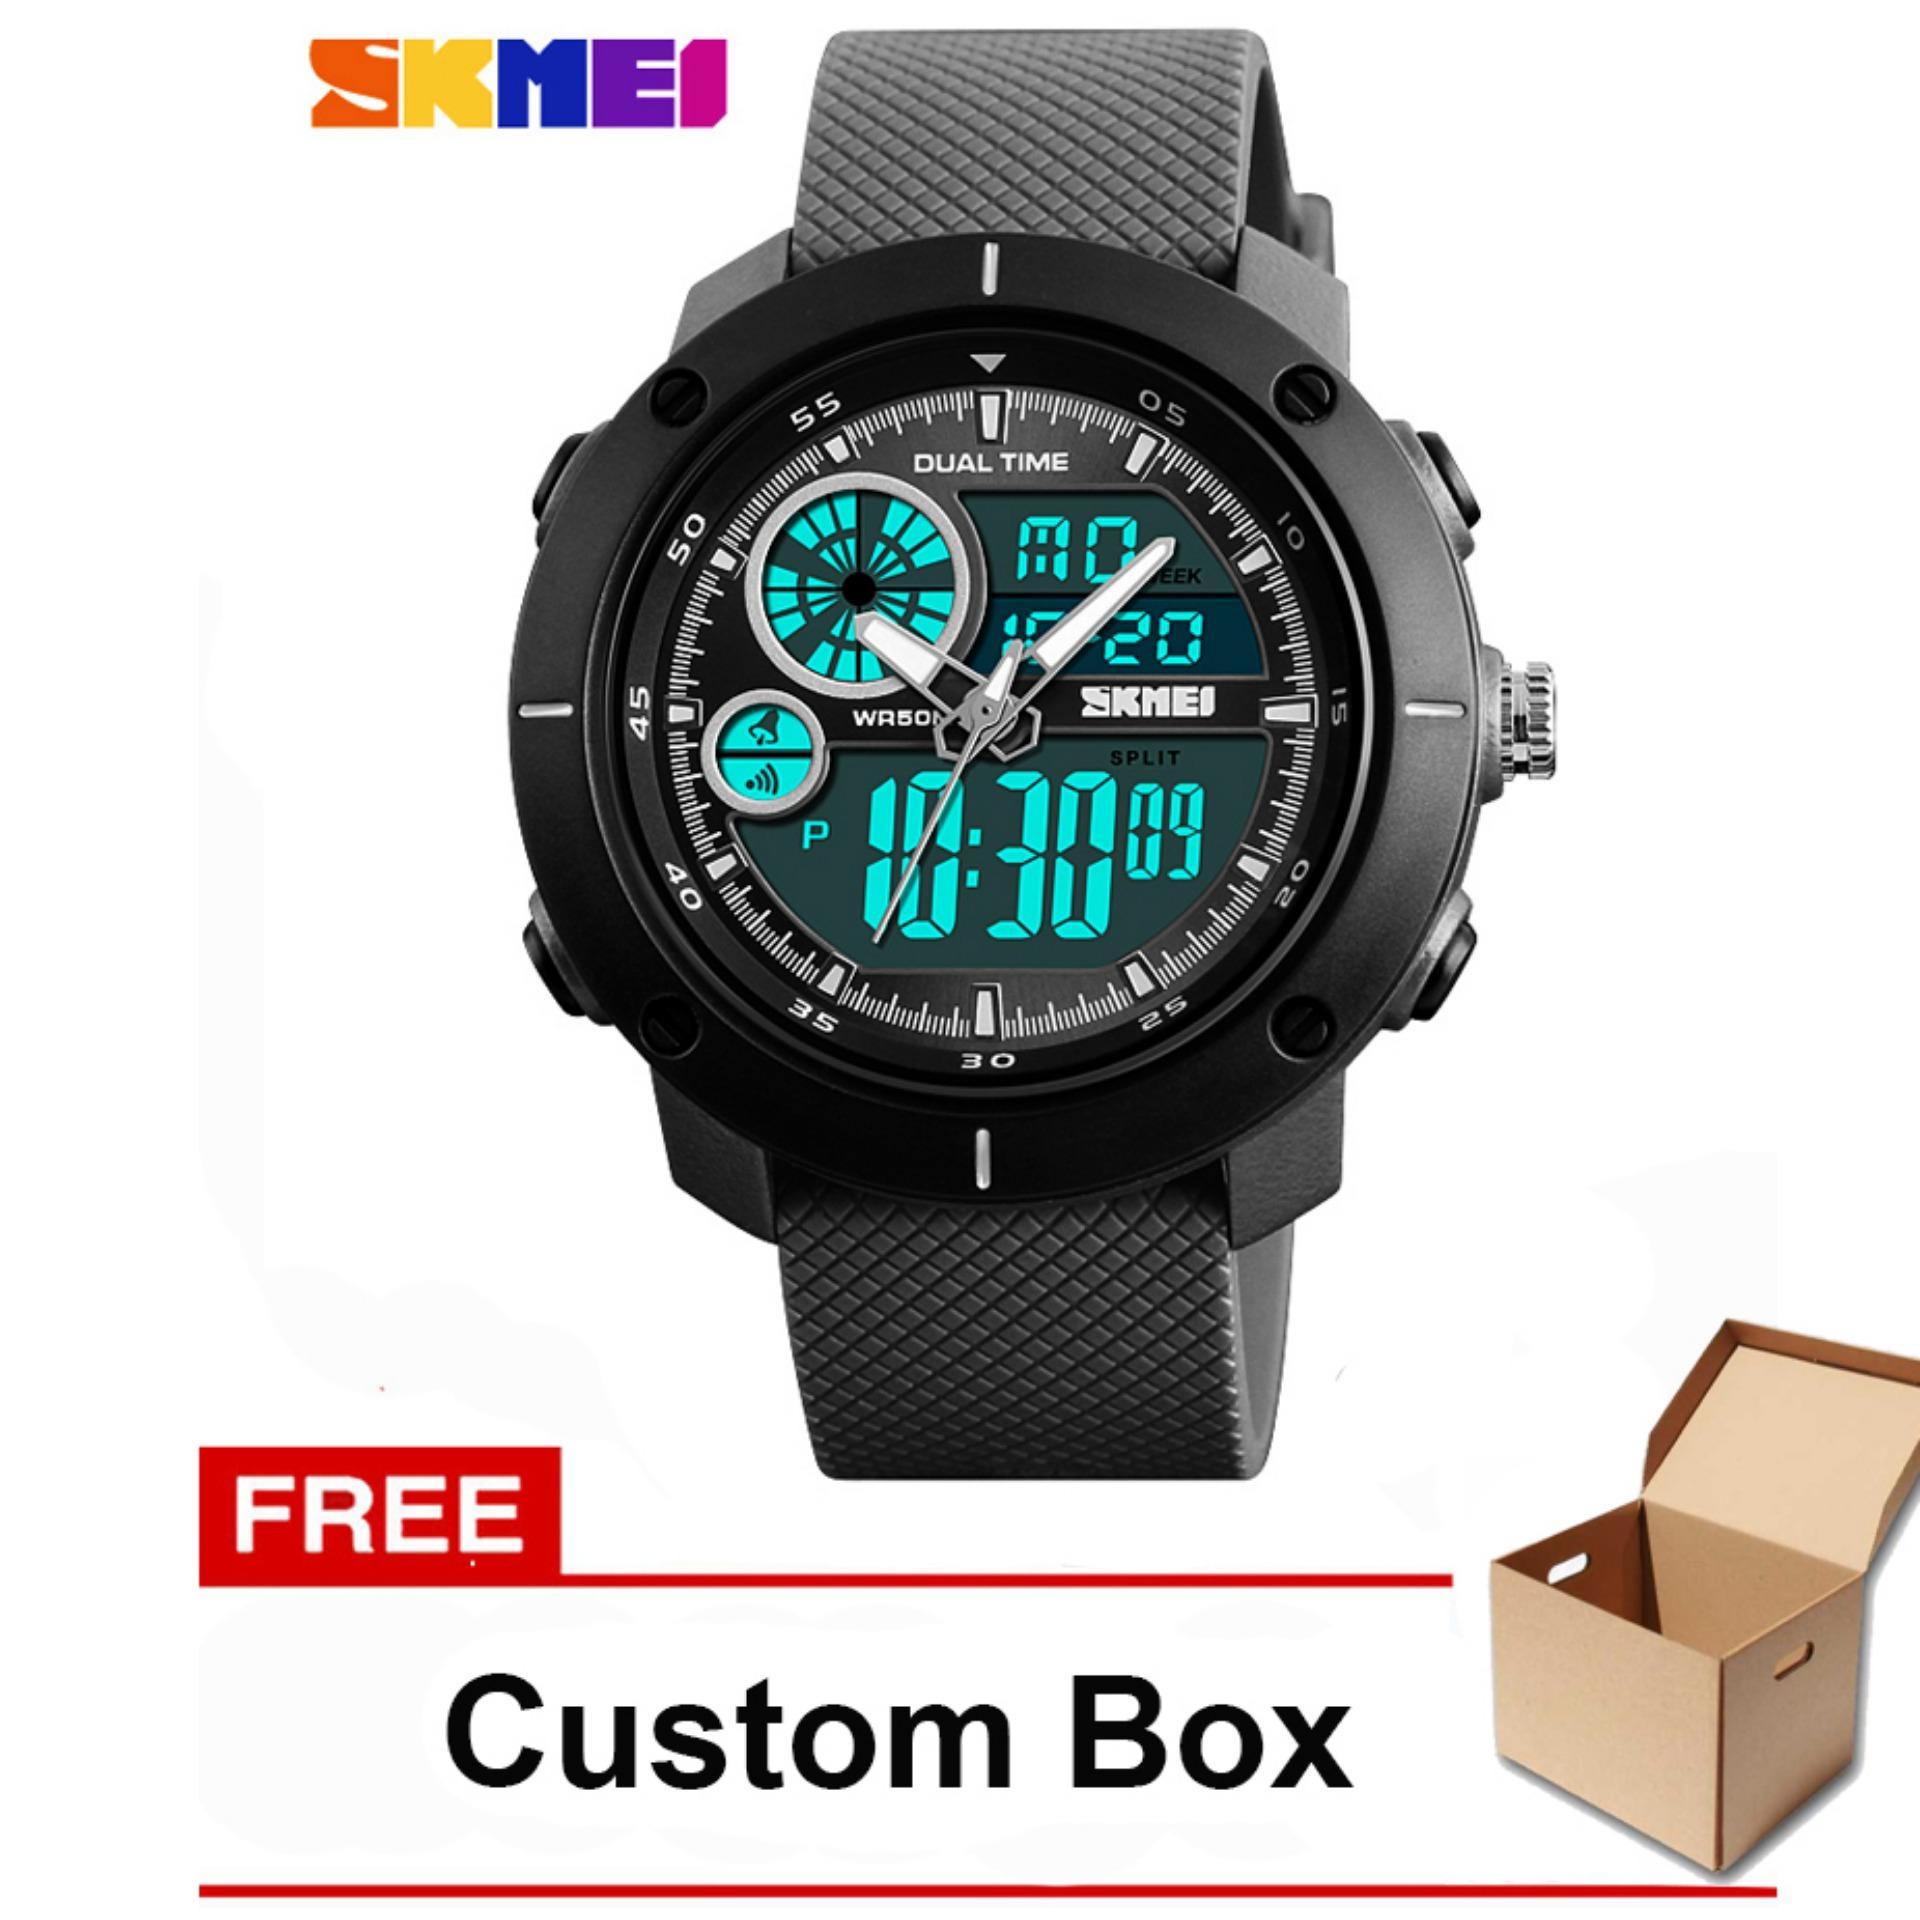 SKMEI 1361 Jam Tangan Pria Sportwatch Dual Time Analog Digital Water Resistant 50M